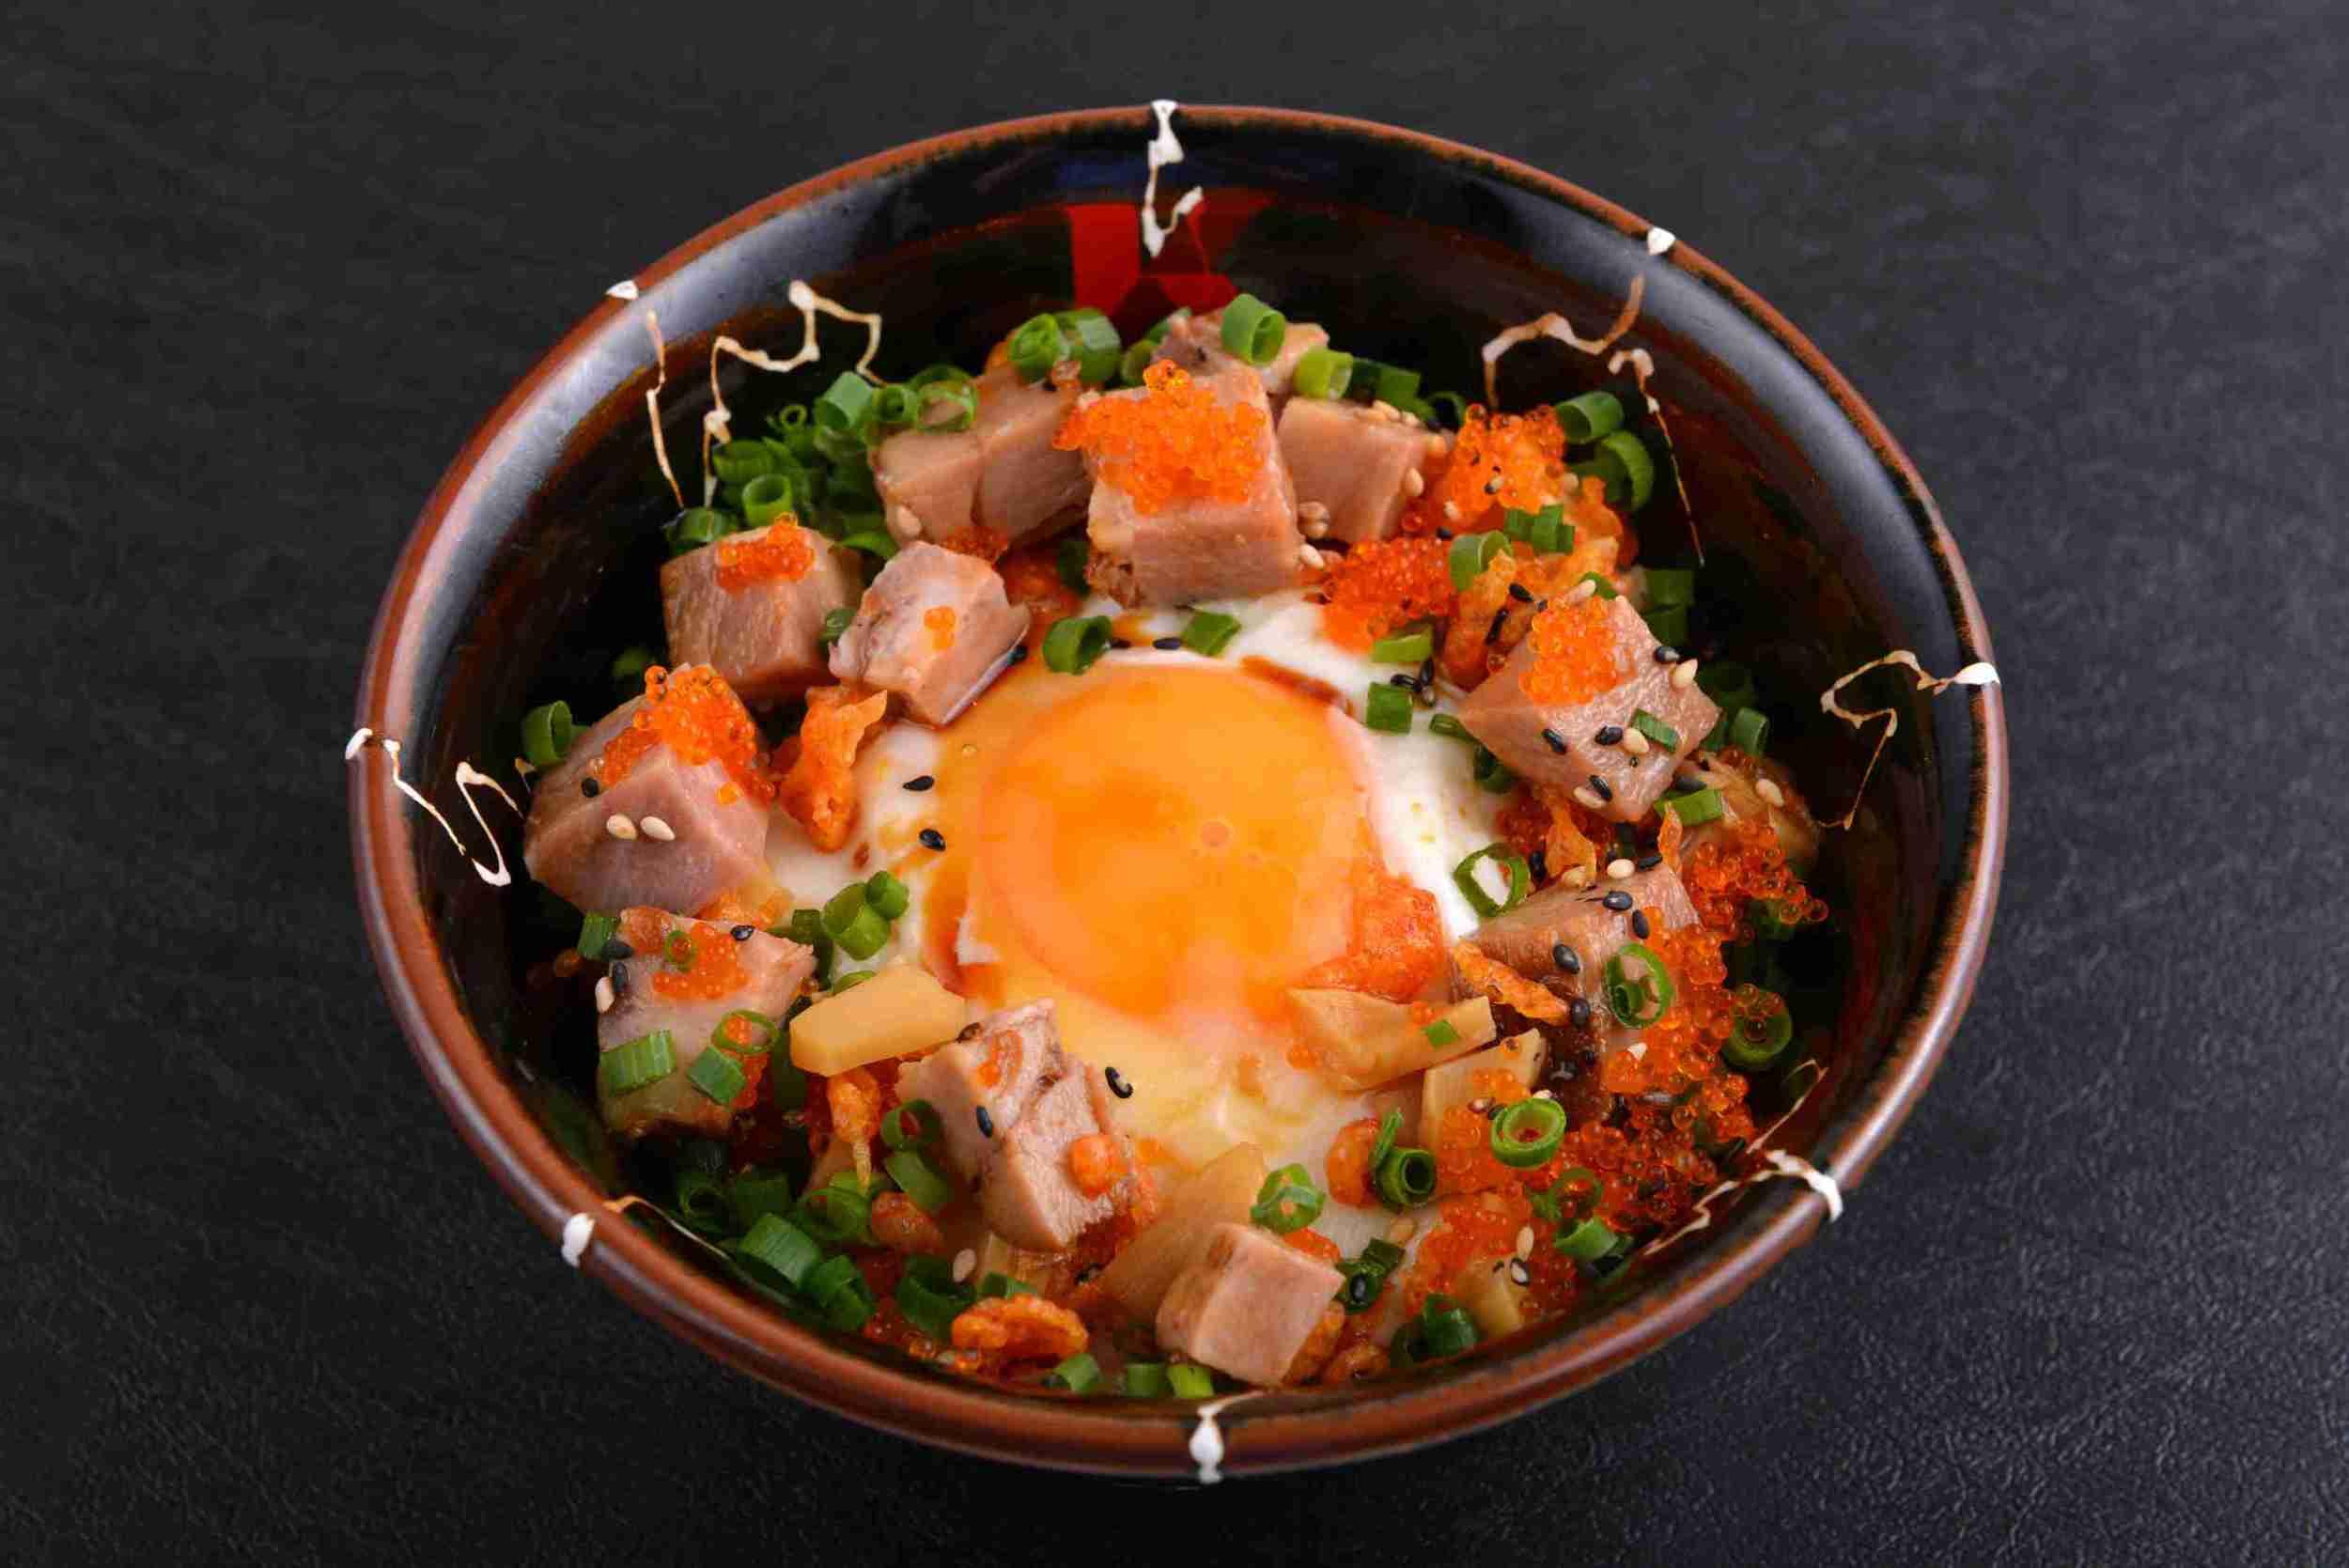 MATSURI MESHI (Fried Egg, Chasyu & Tobikko Roe on Rice) ($7.00)